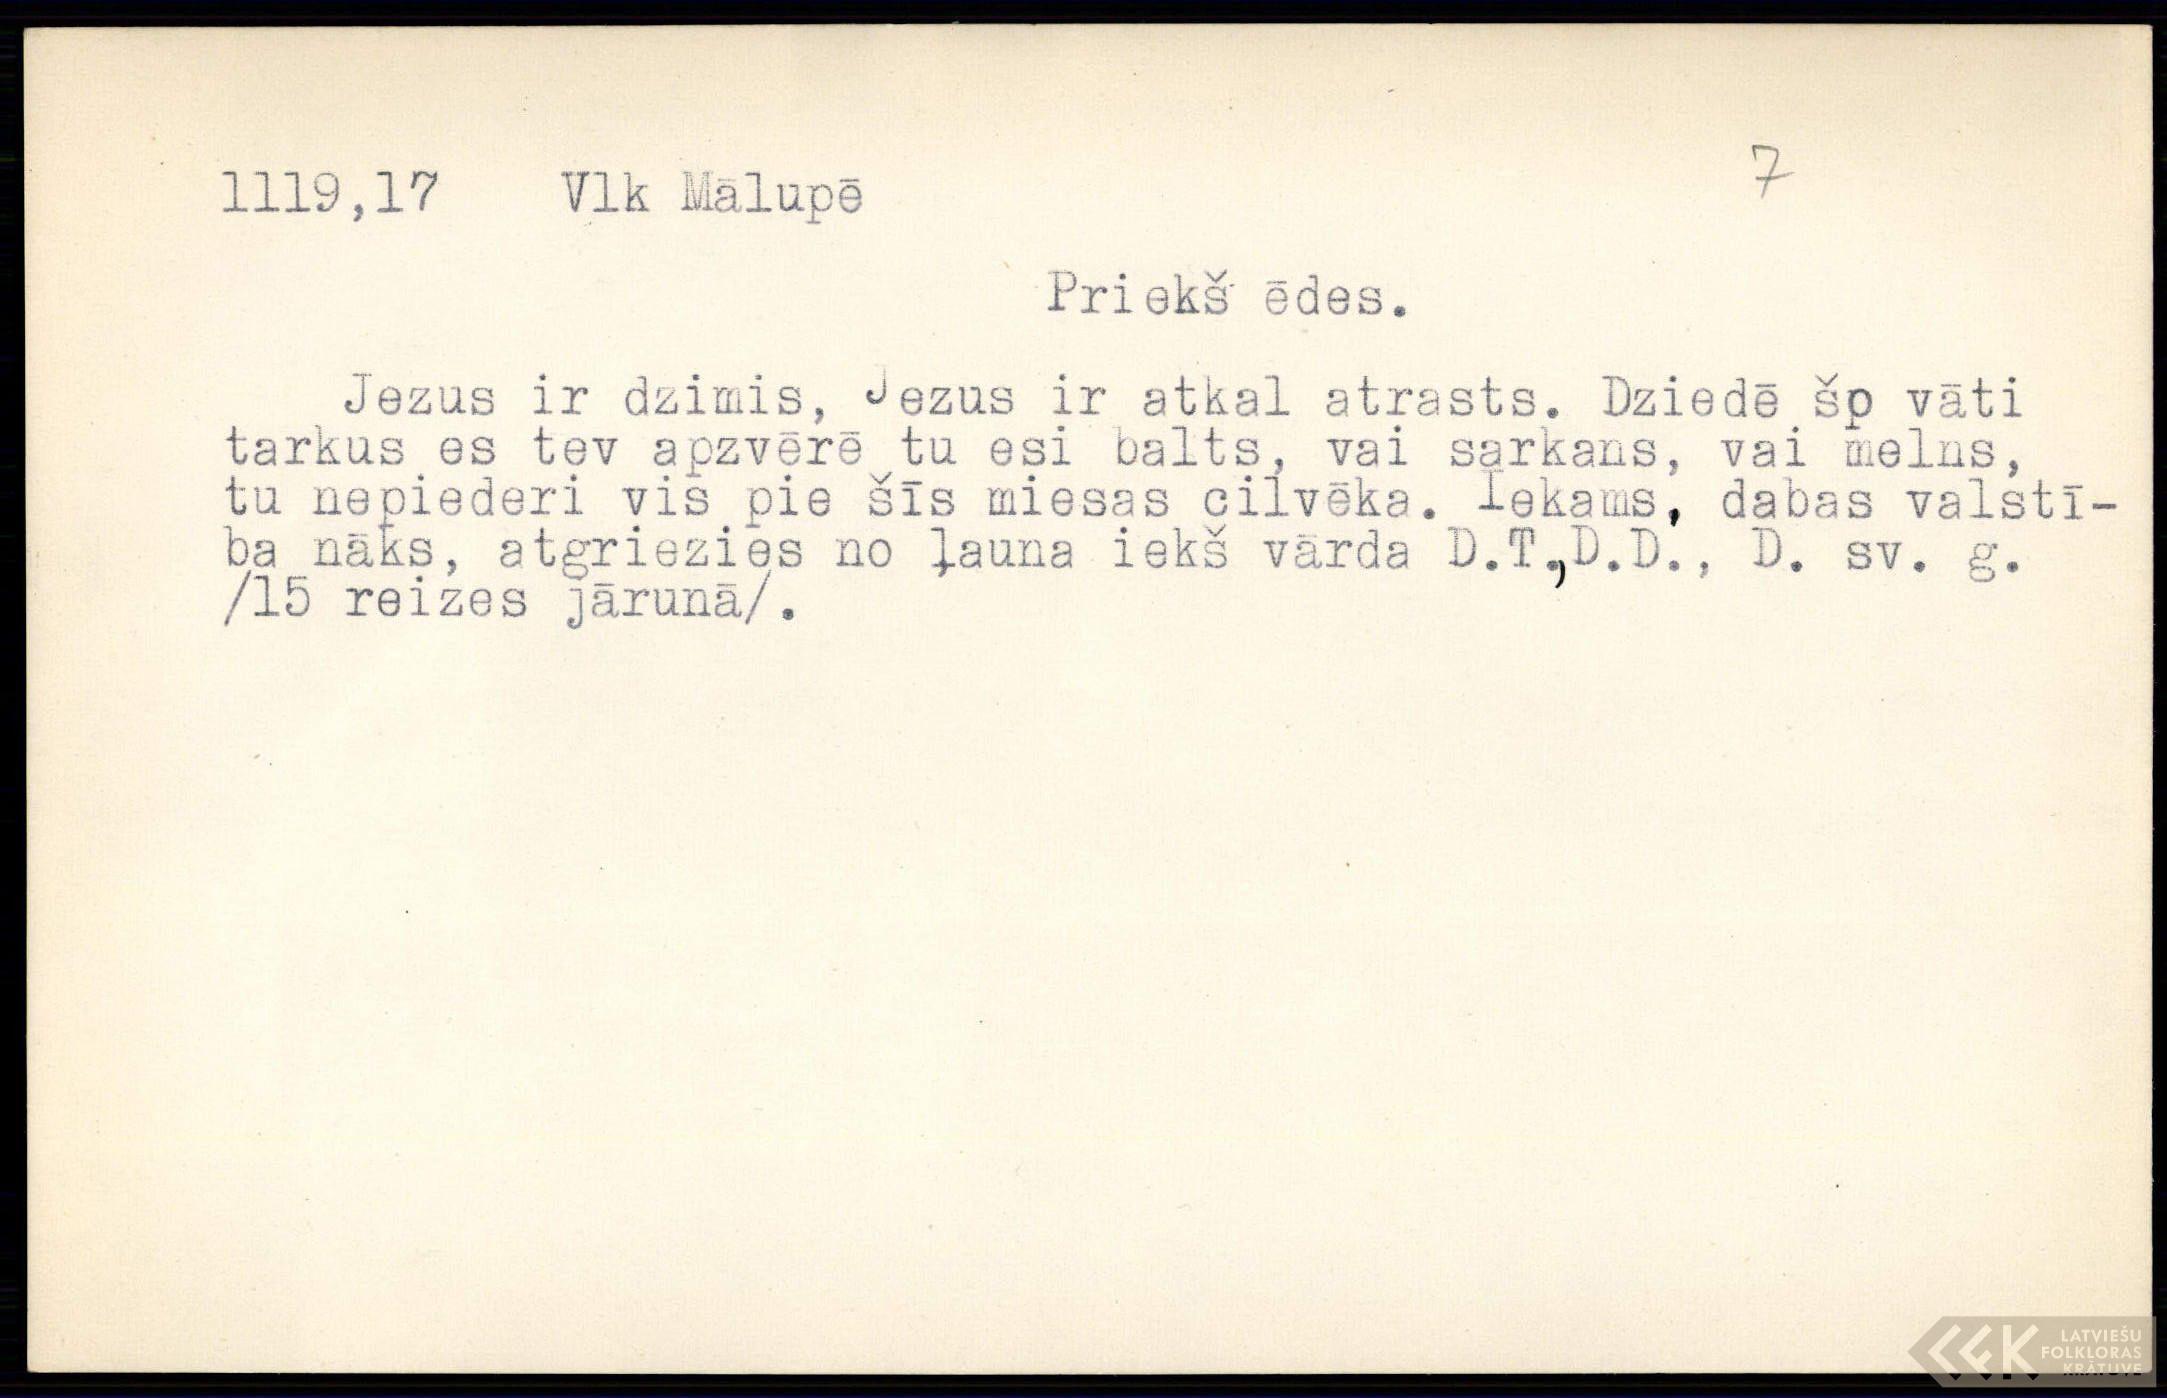 LFK-1119-00017-buramvardu-kartoteka